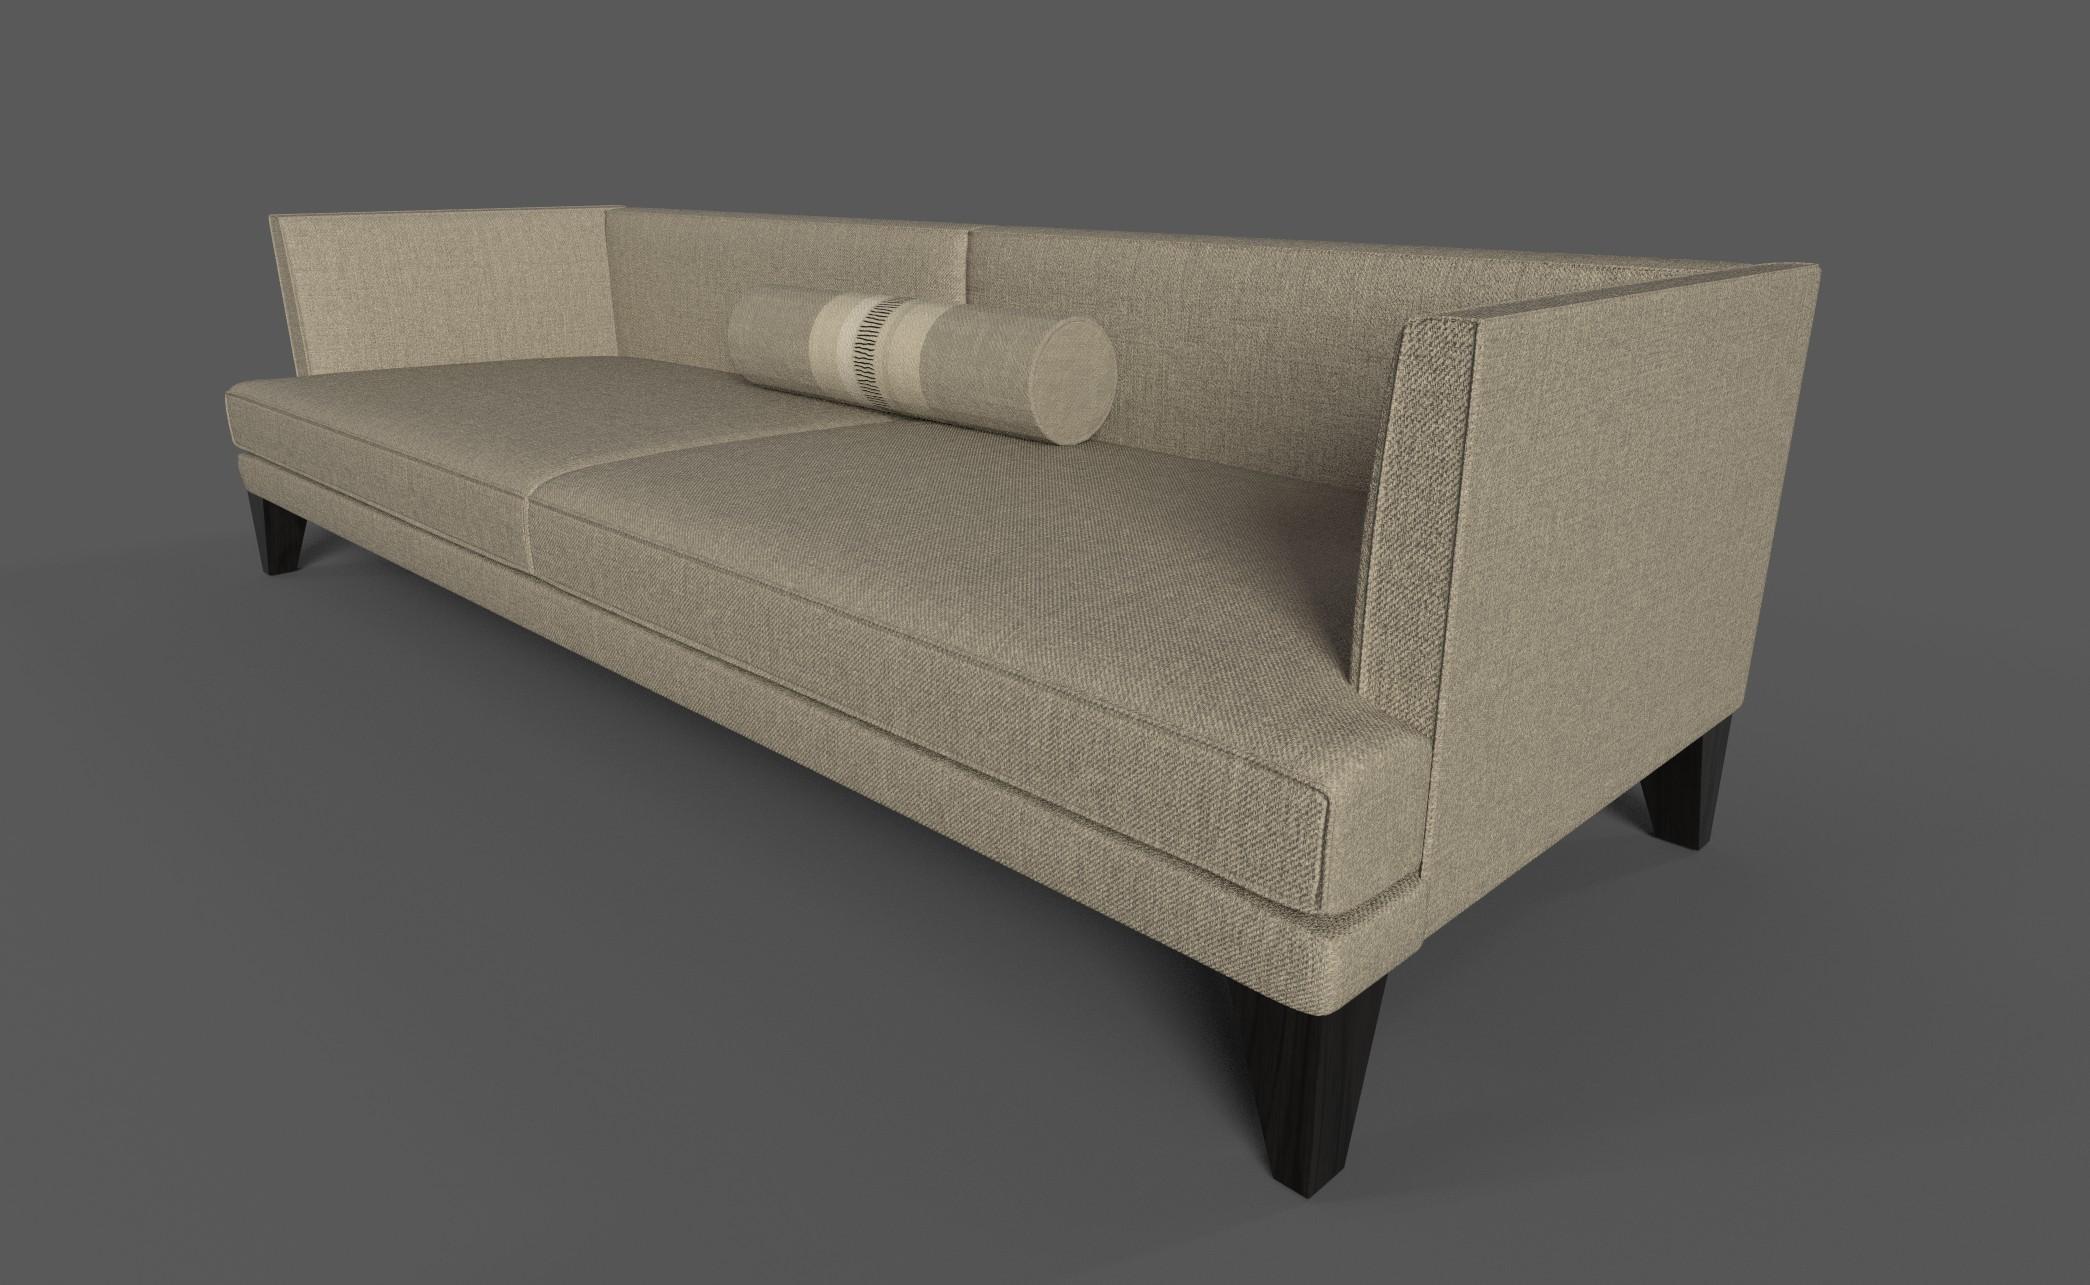 Sofa for Unreal Engine 4 client sofarender rev2 JPG